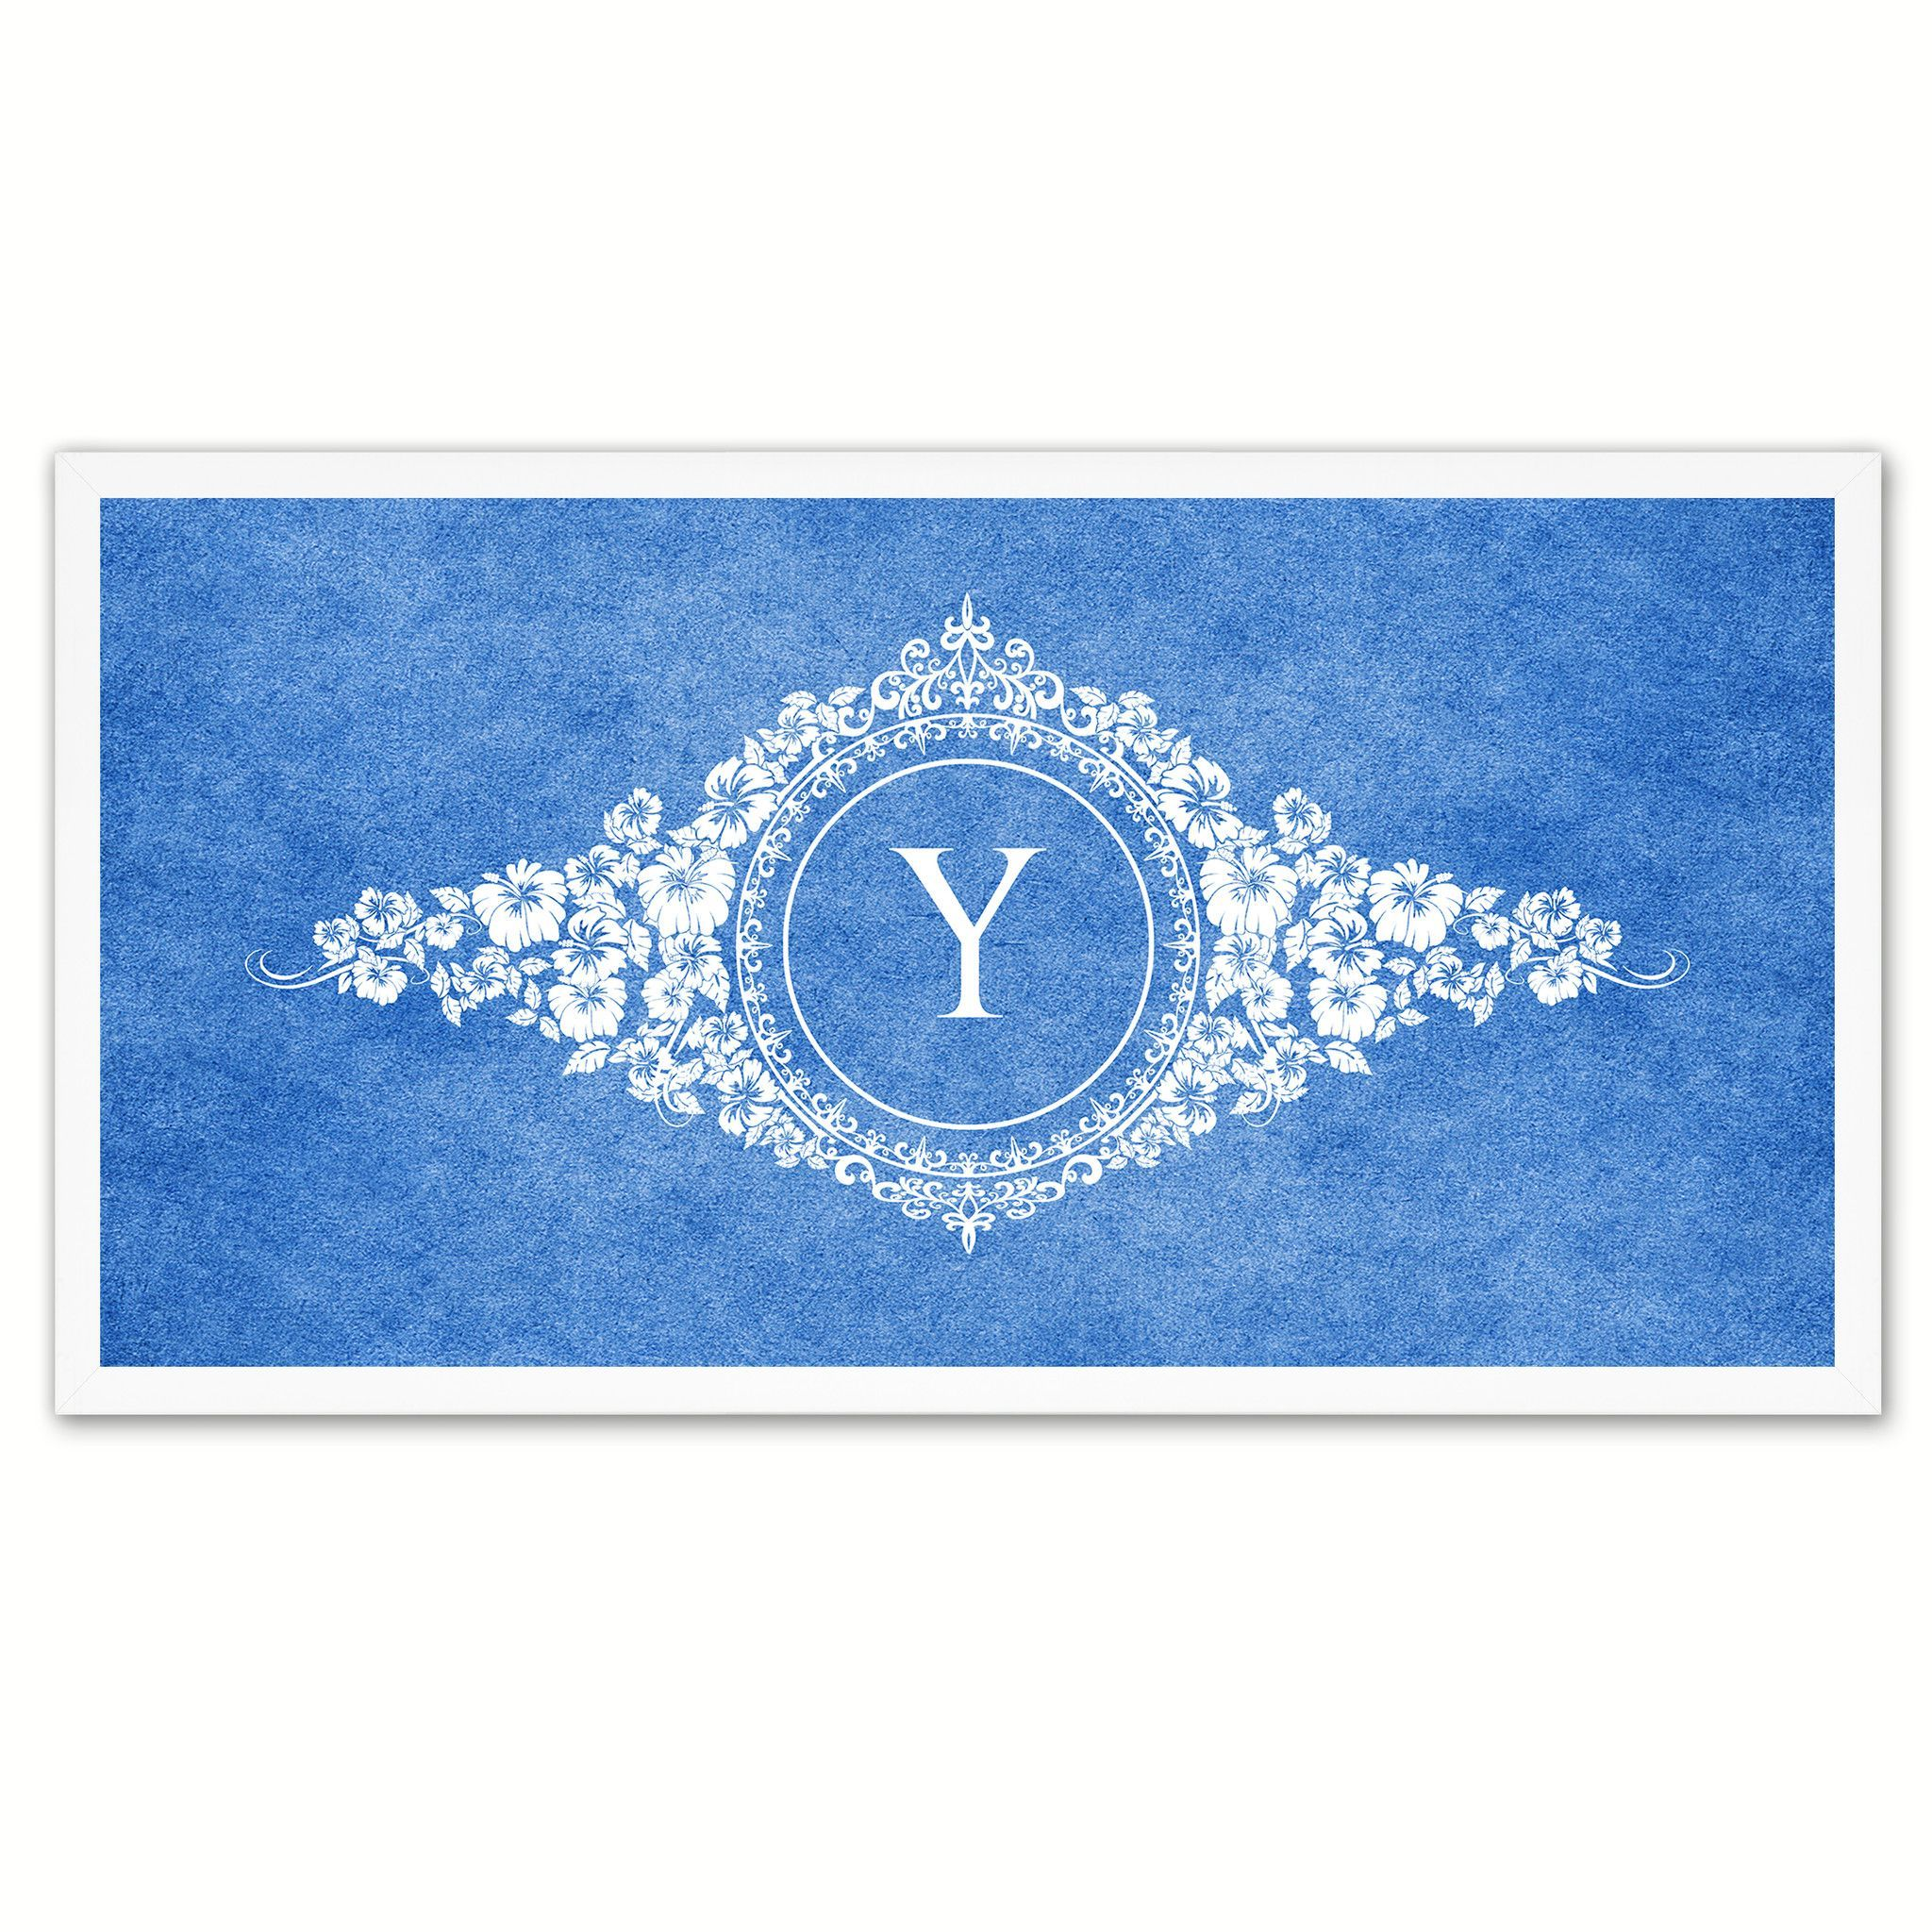 Alphabet Letter Y Blue Canvas Print White Frame Kids Bedroom Wall Décor Home Art